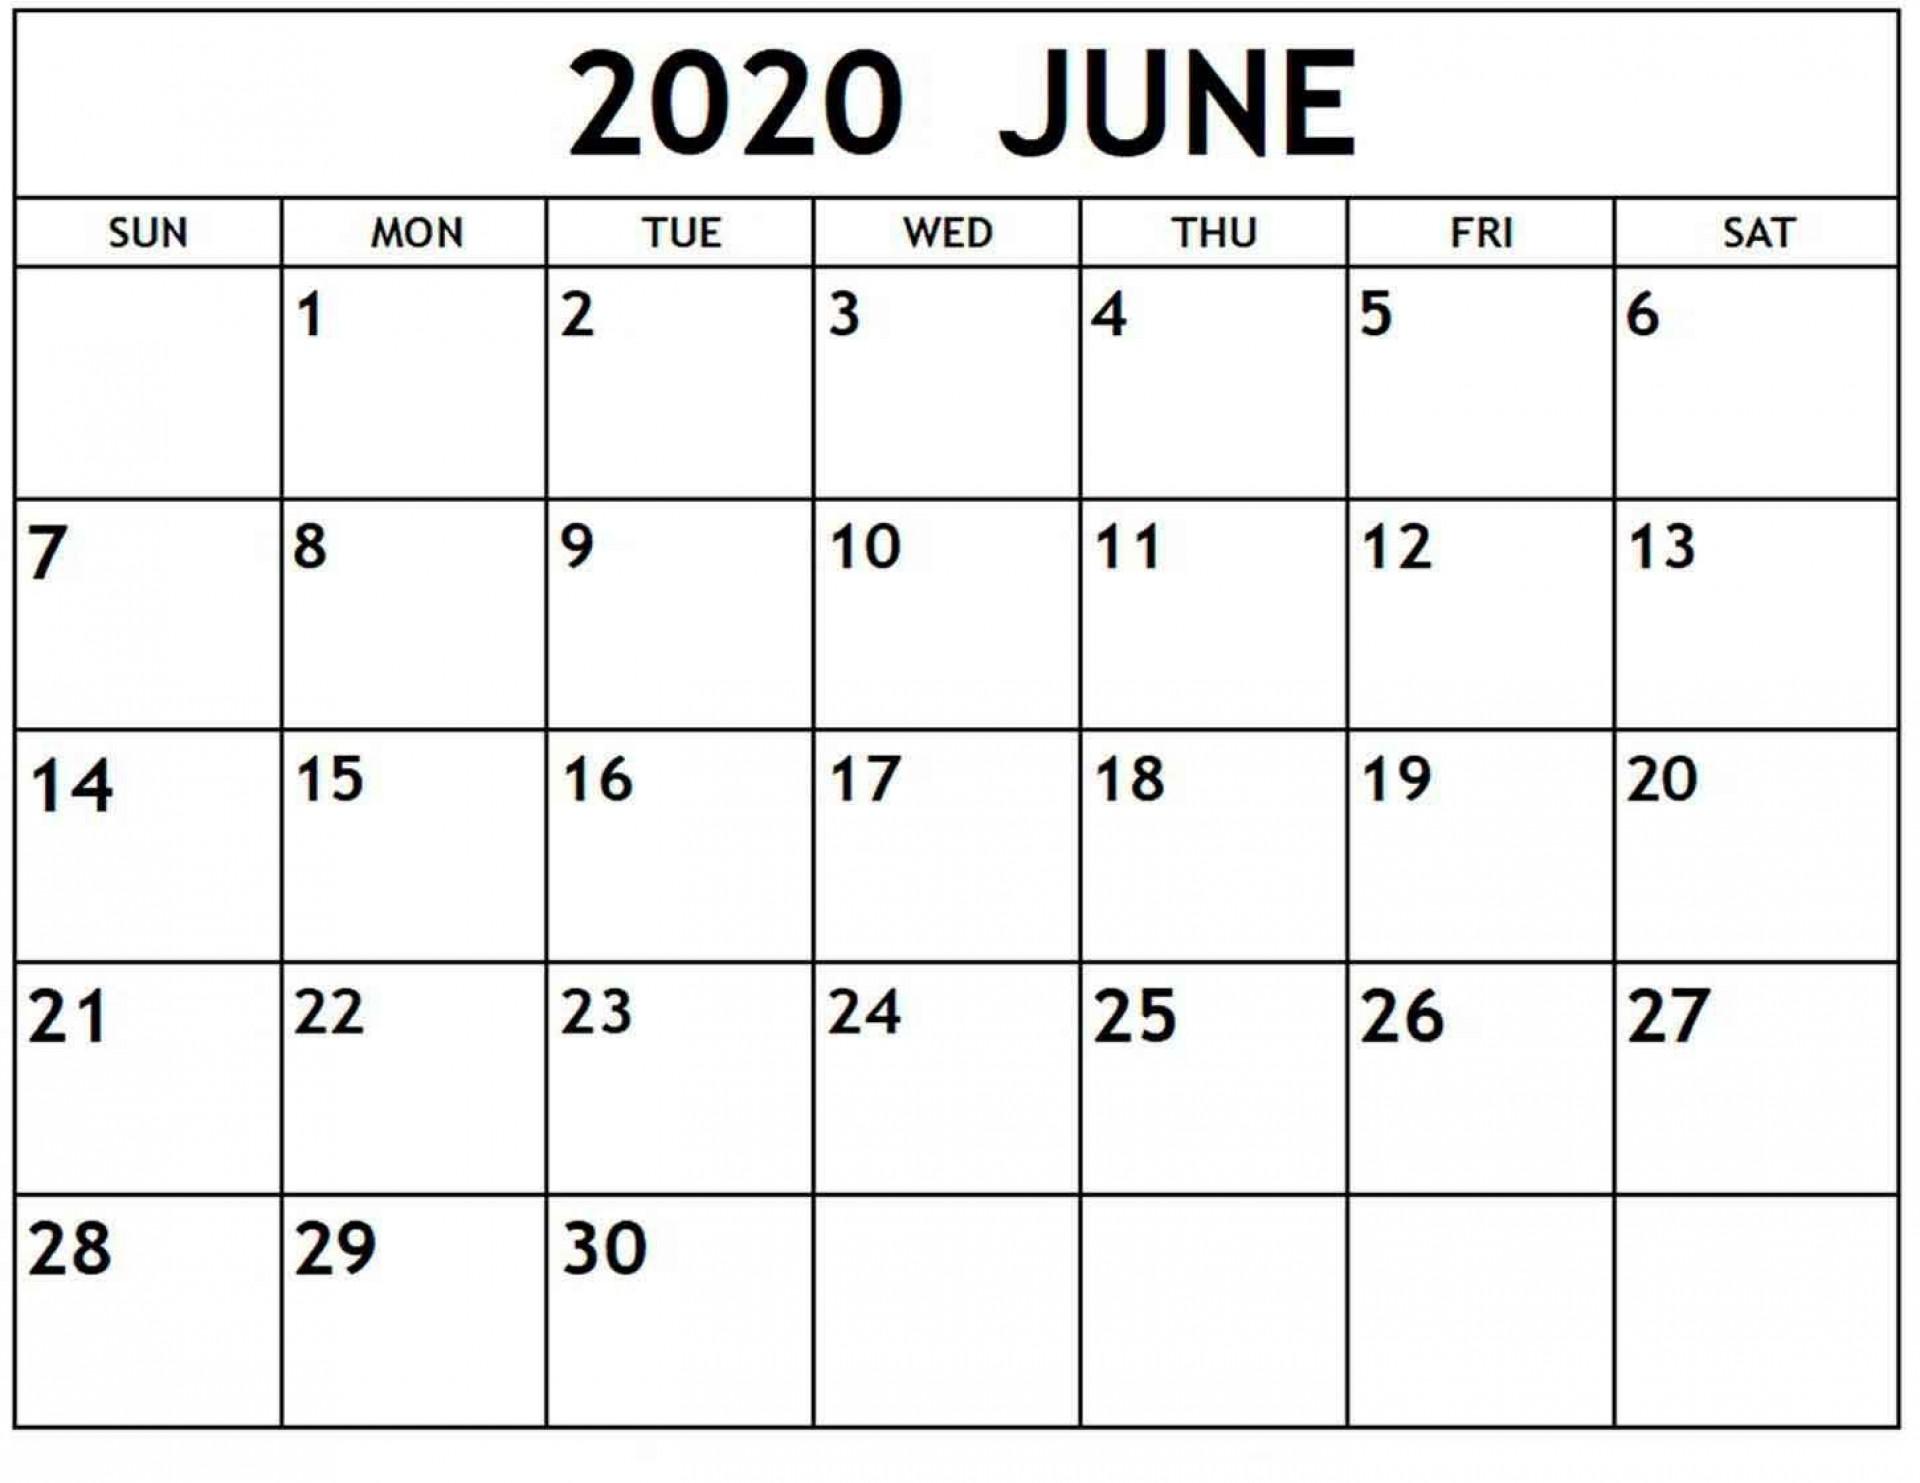 009 Phenomenal Printable Calendar Template June 2020 High Resolution  Free1920